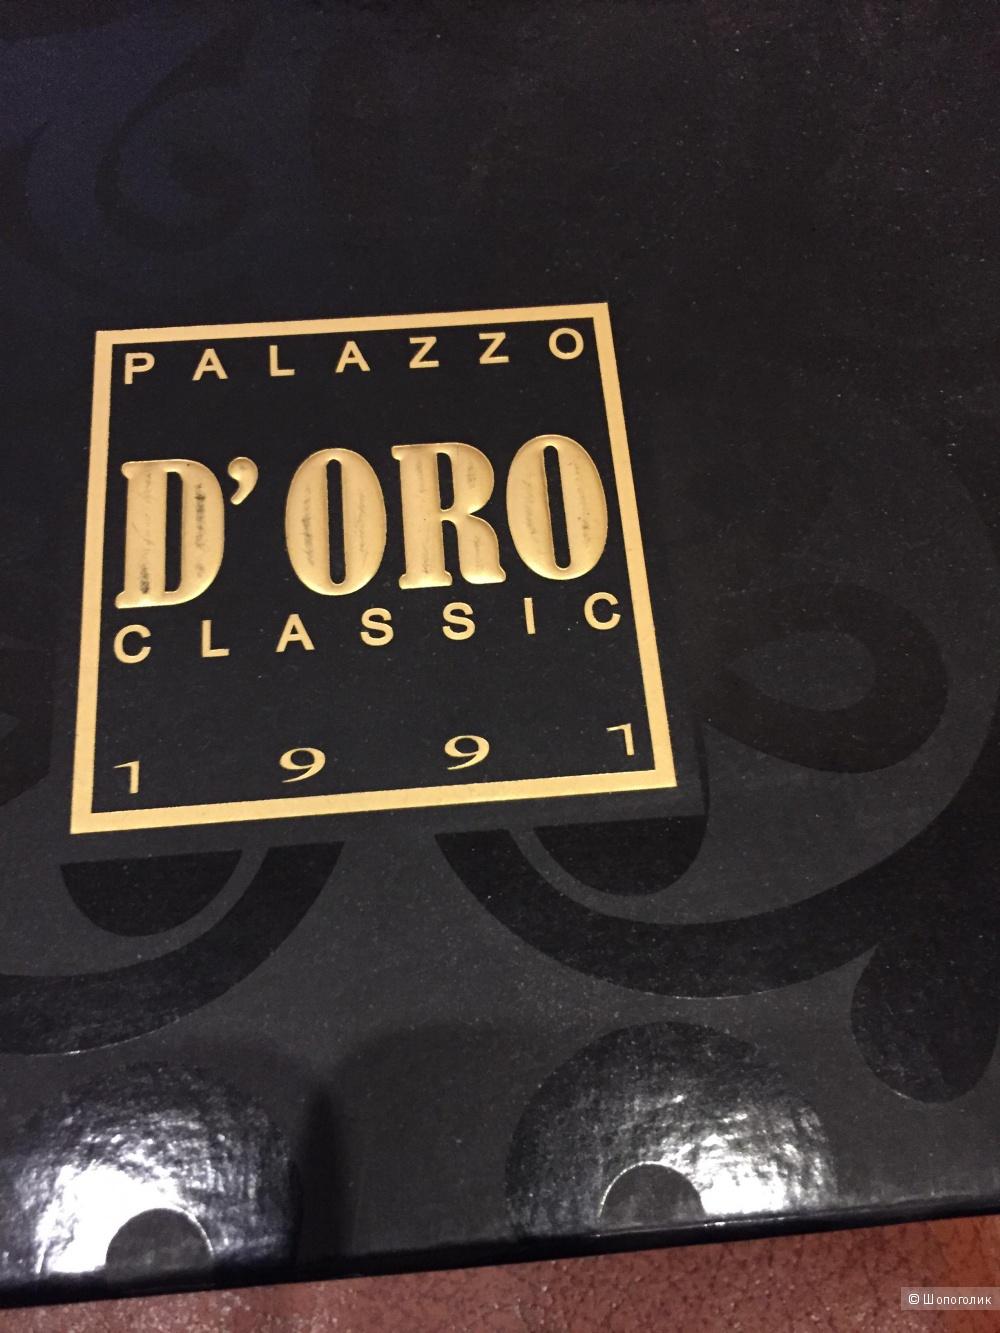 Ботильоны Palazzo D'oro